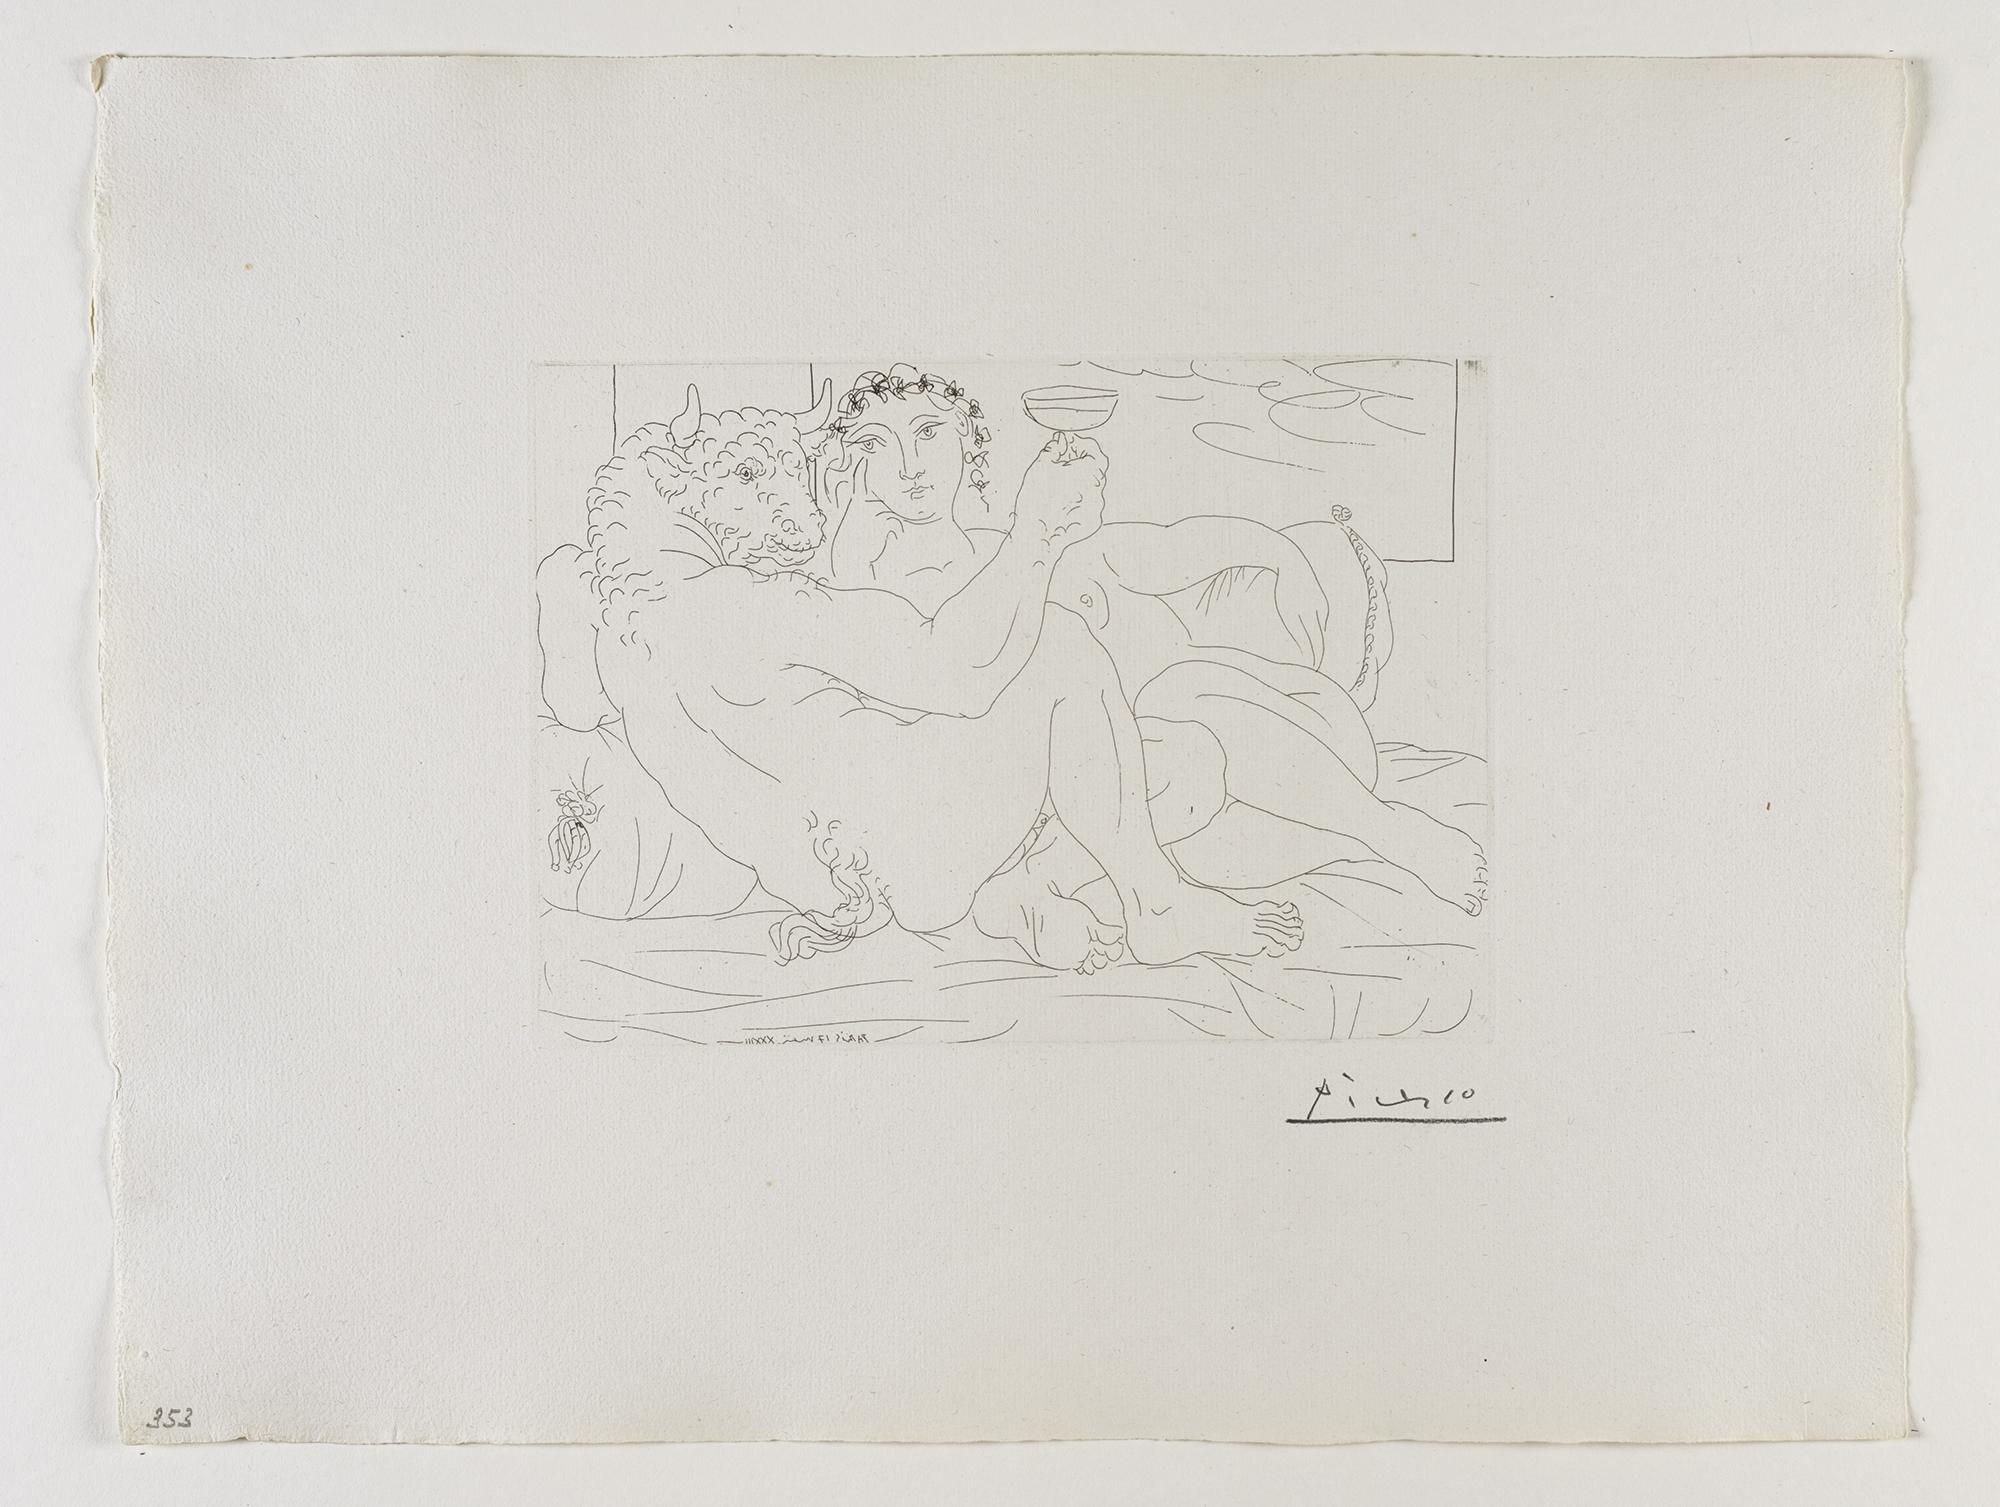 Le Repos du Minotaure : Champagne et Amante    恬靜的  ⽶米諾陶洛斯:⾹香檳與愛⼈人   Etching, 1933 /Bloch 190; Baer 349 only state, B.c (of B.d.); S.V. 83; HP 353  Image Size : 19.8 x 27.0 cm (7.8 x 10.63 in)  Sheet Size : 38.5 x 49.9 cm (15.16 x 19.65 in)